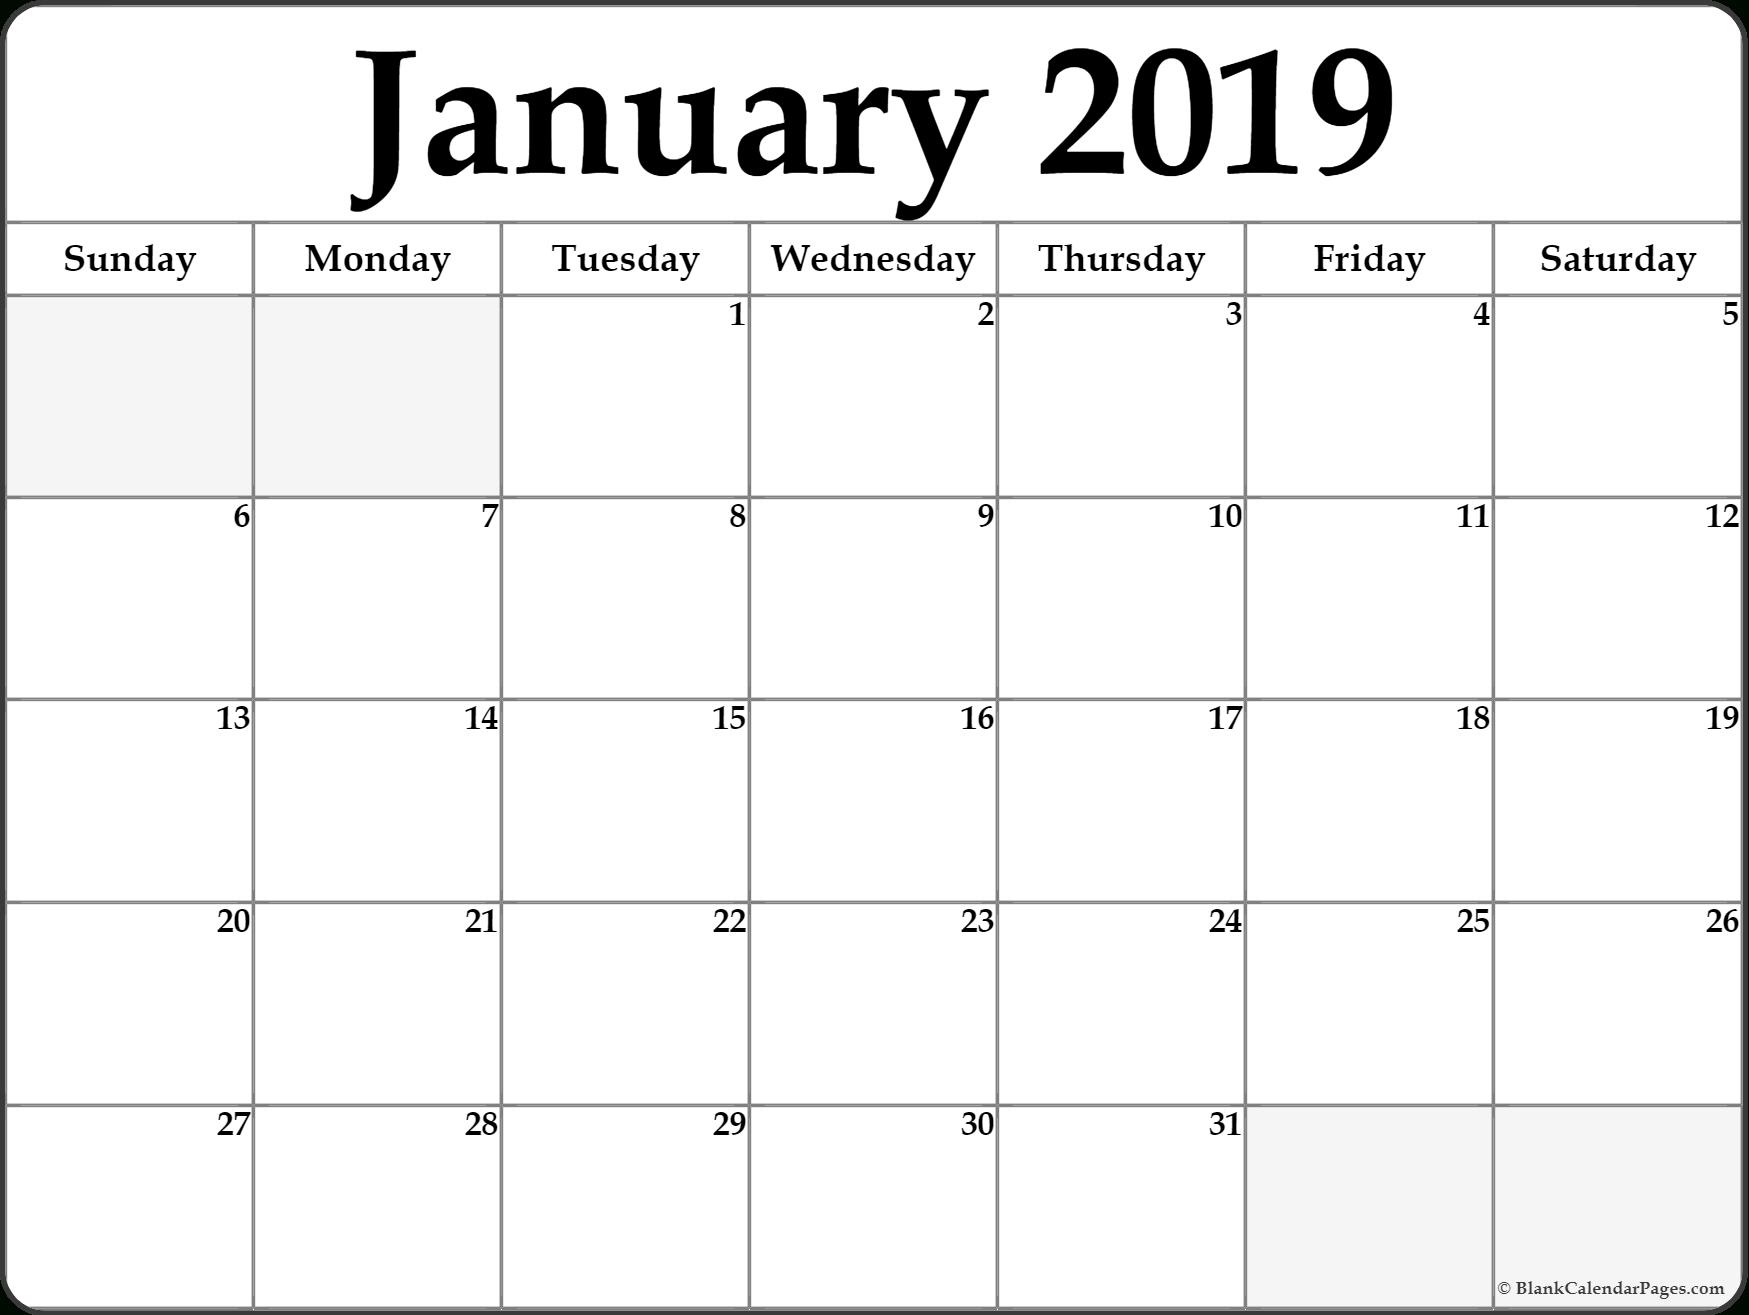 Show Me A March 2019 Calendar | Calendar Format Example Show A 2019 Calendar